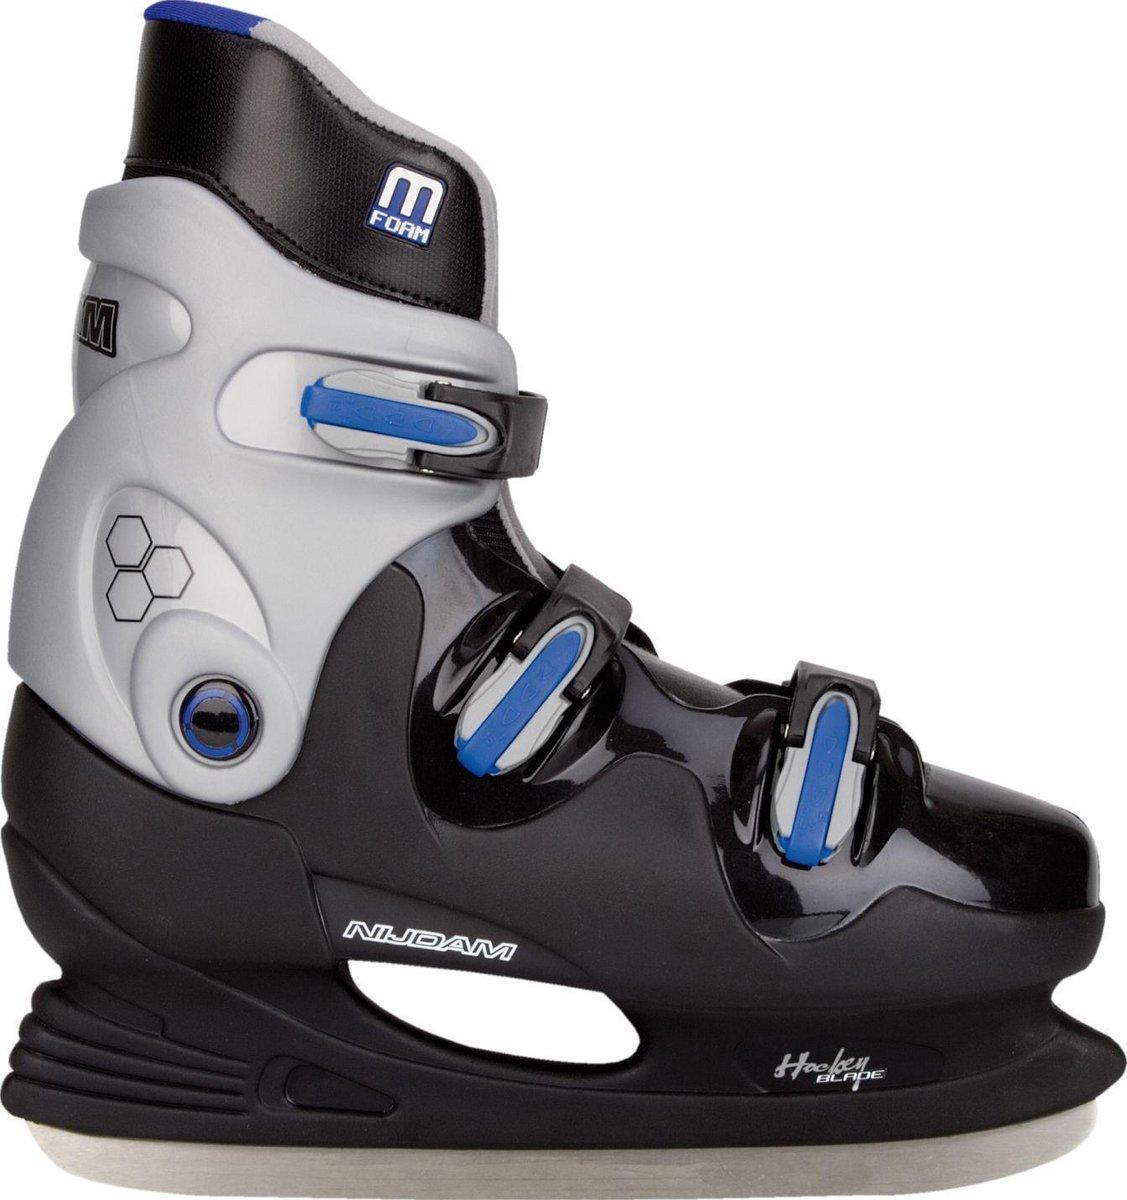 Nijdam IJshockeyschaats - Hardboot - Zwart/Blauw - Maat 45